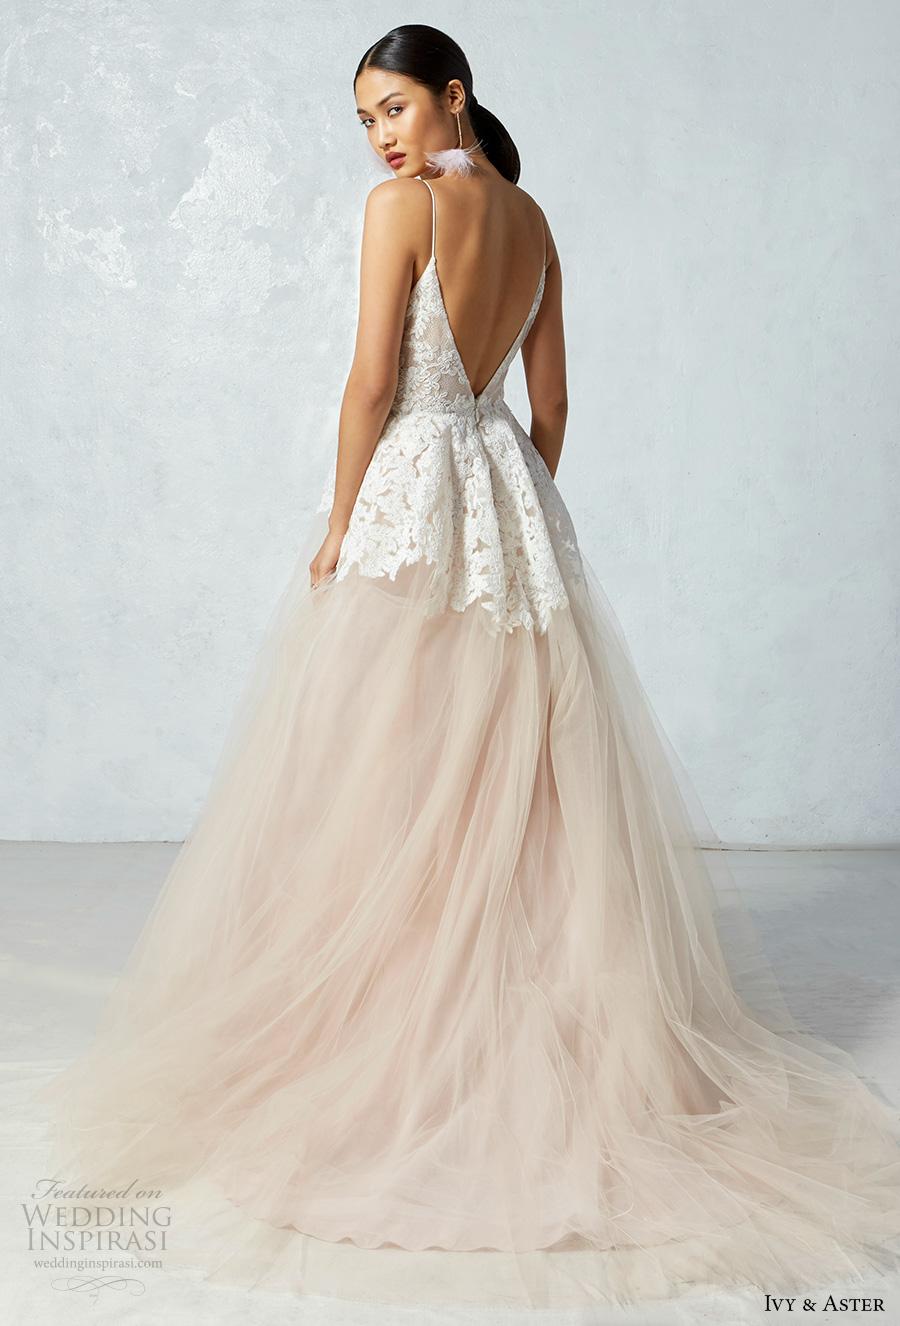 Blush Low Back Wedding Dress : Ivy aster fall wedding dresses crazyforus